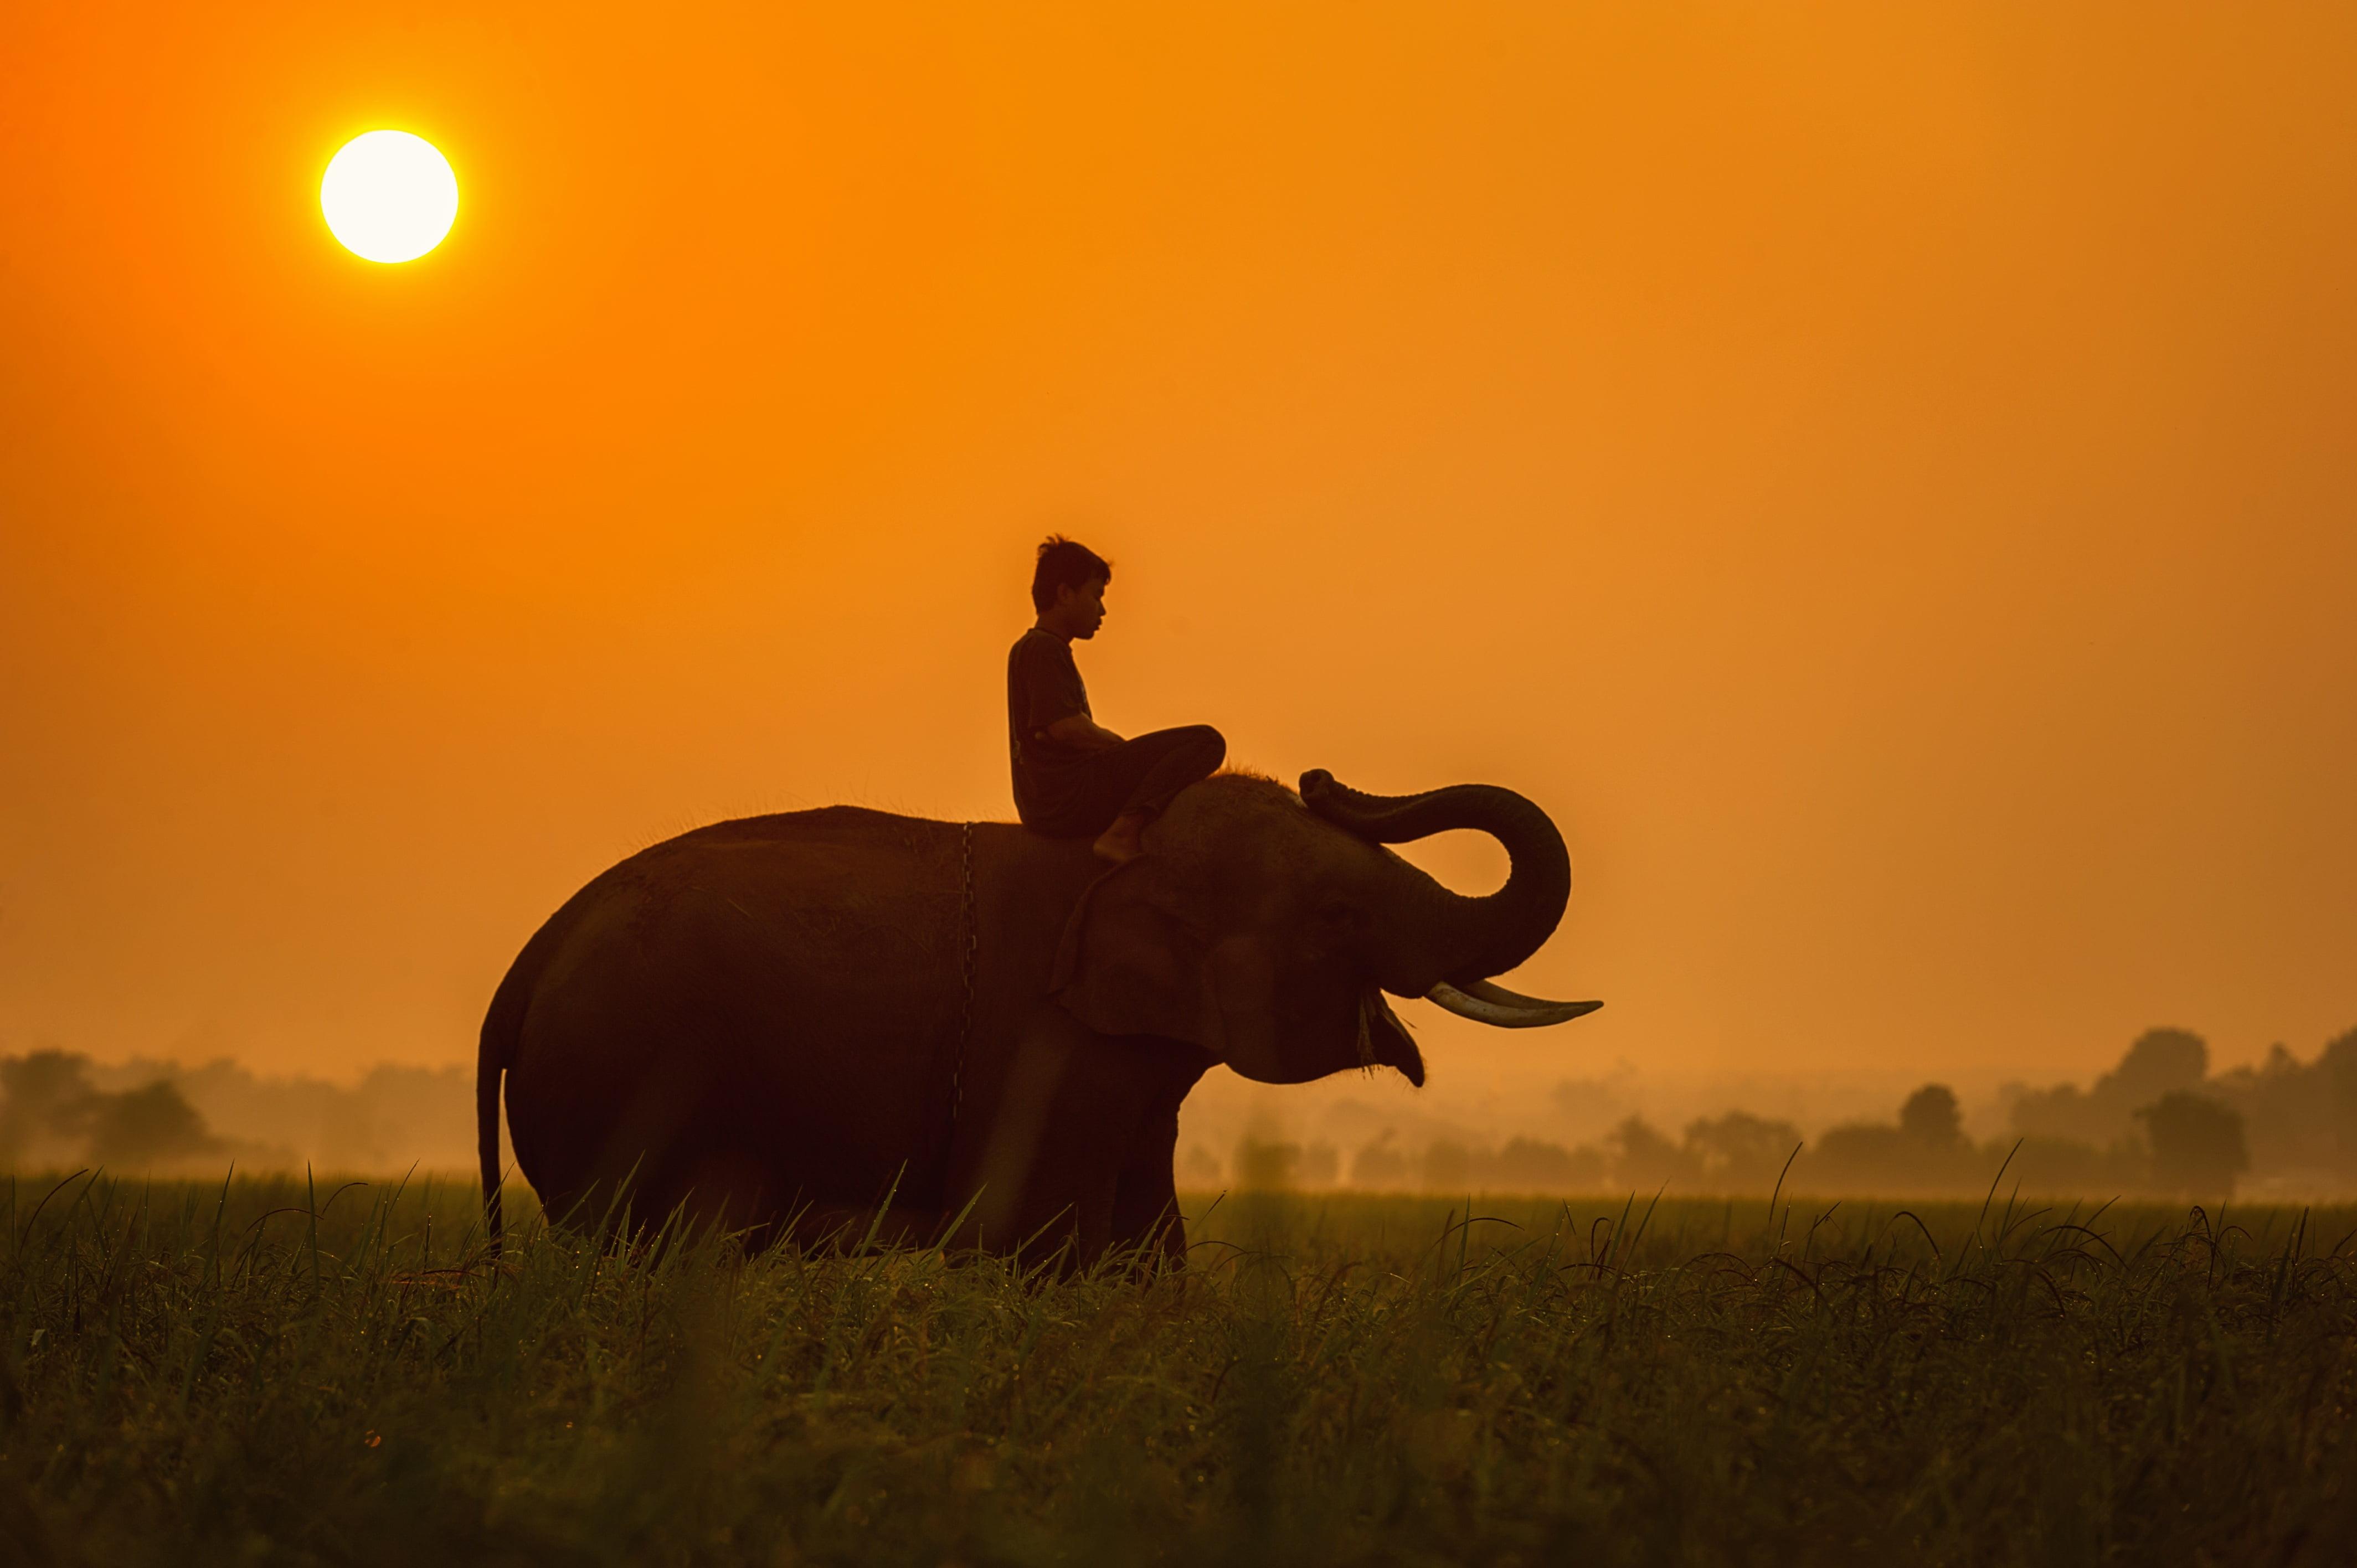 Cartoon Cute Couple Wallpaper Boy On Elephant During Sunset Hd Wallpaper Wallpaper Flare